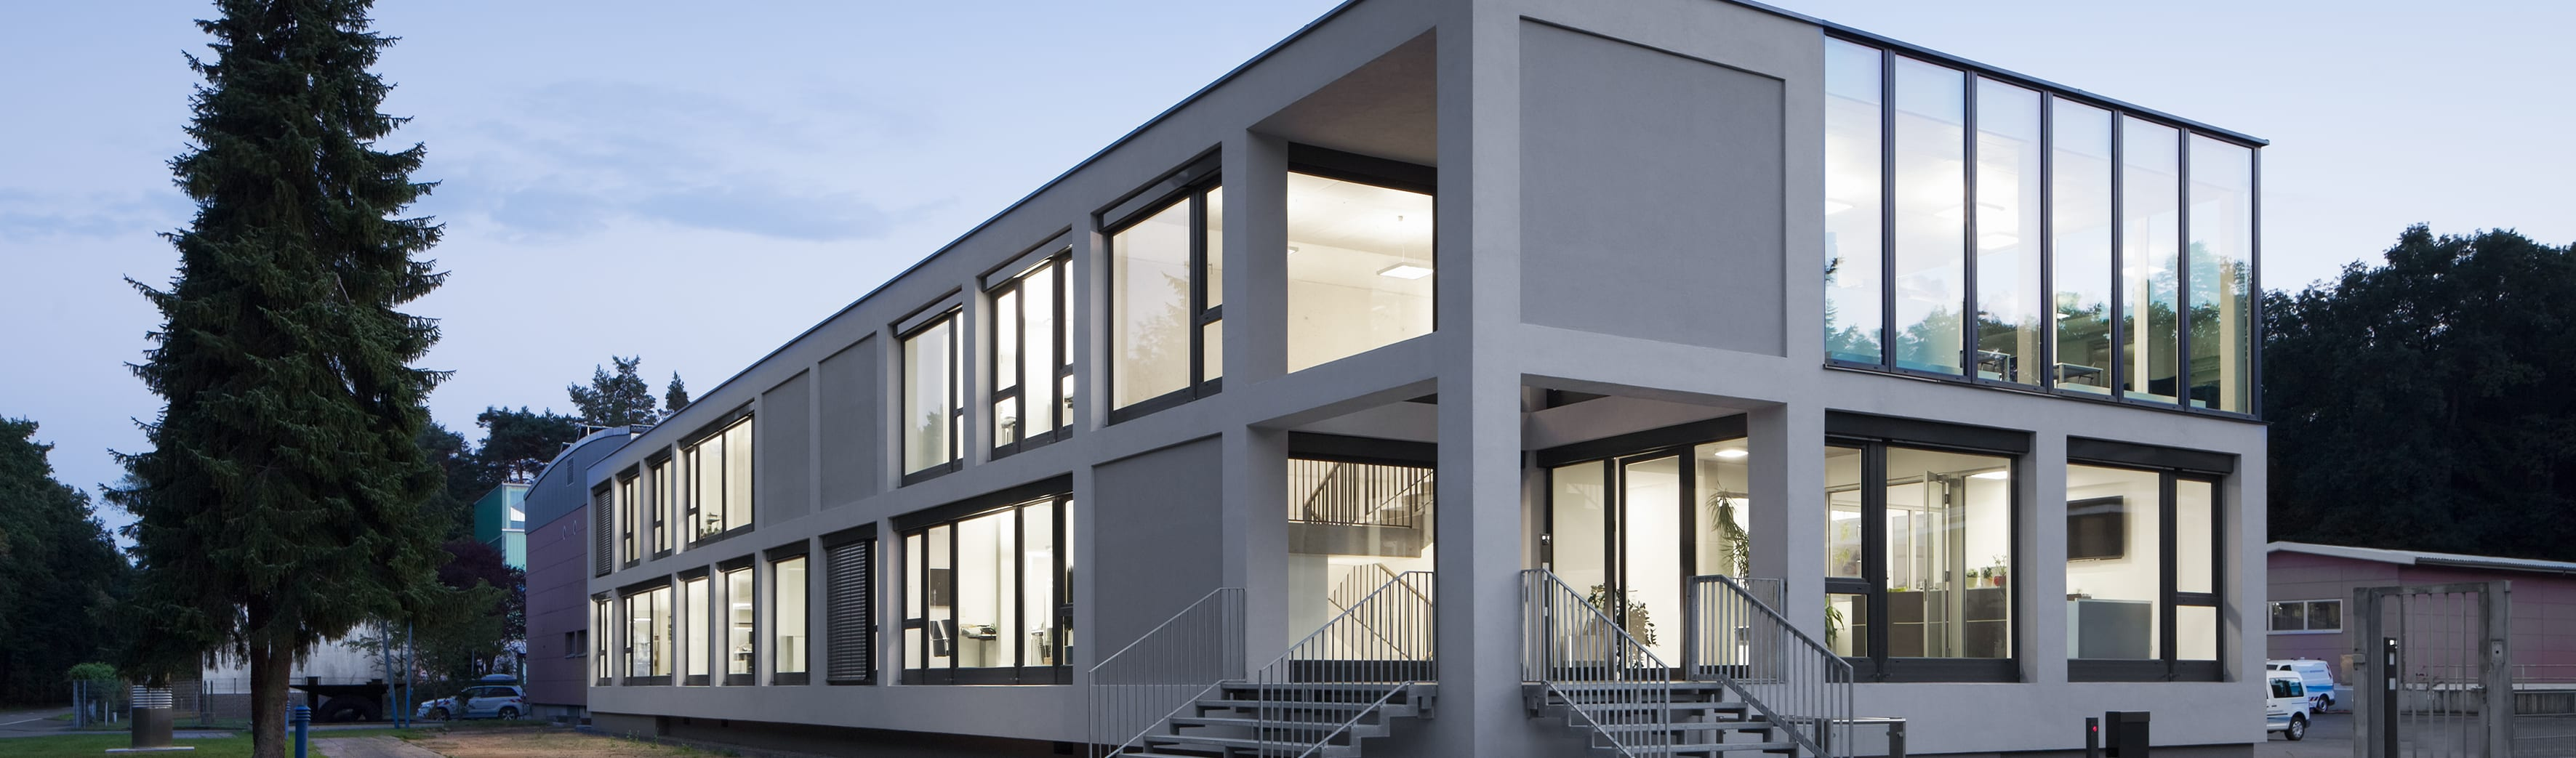 +studio moeve architekten bda